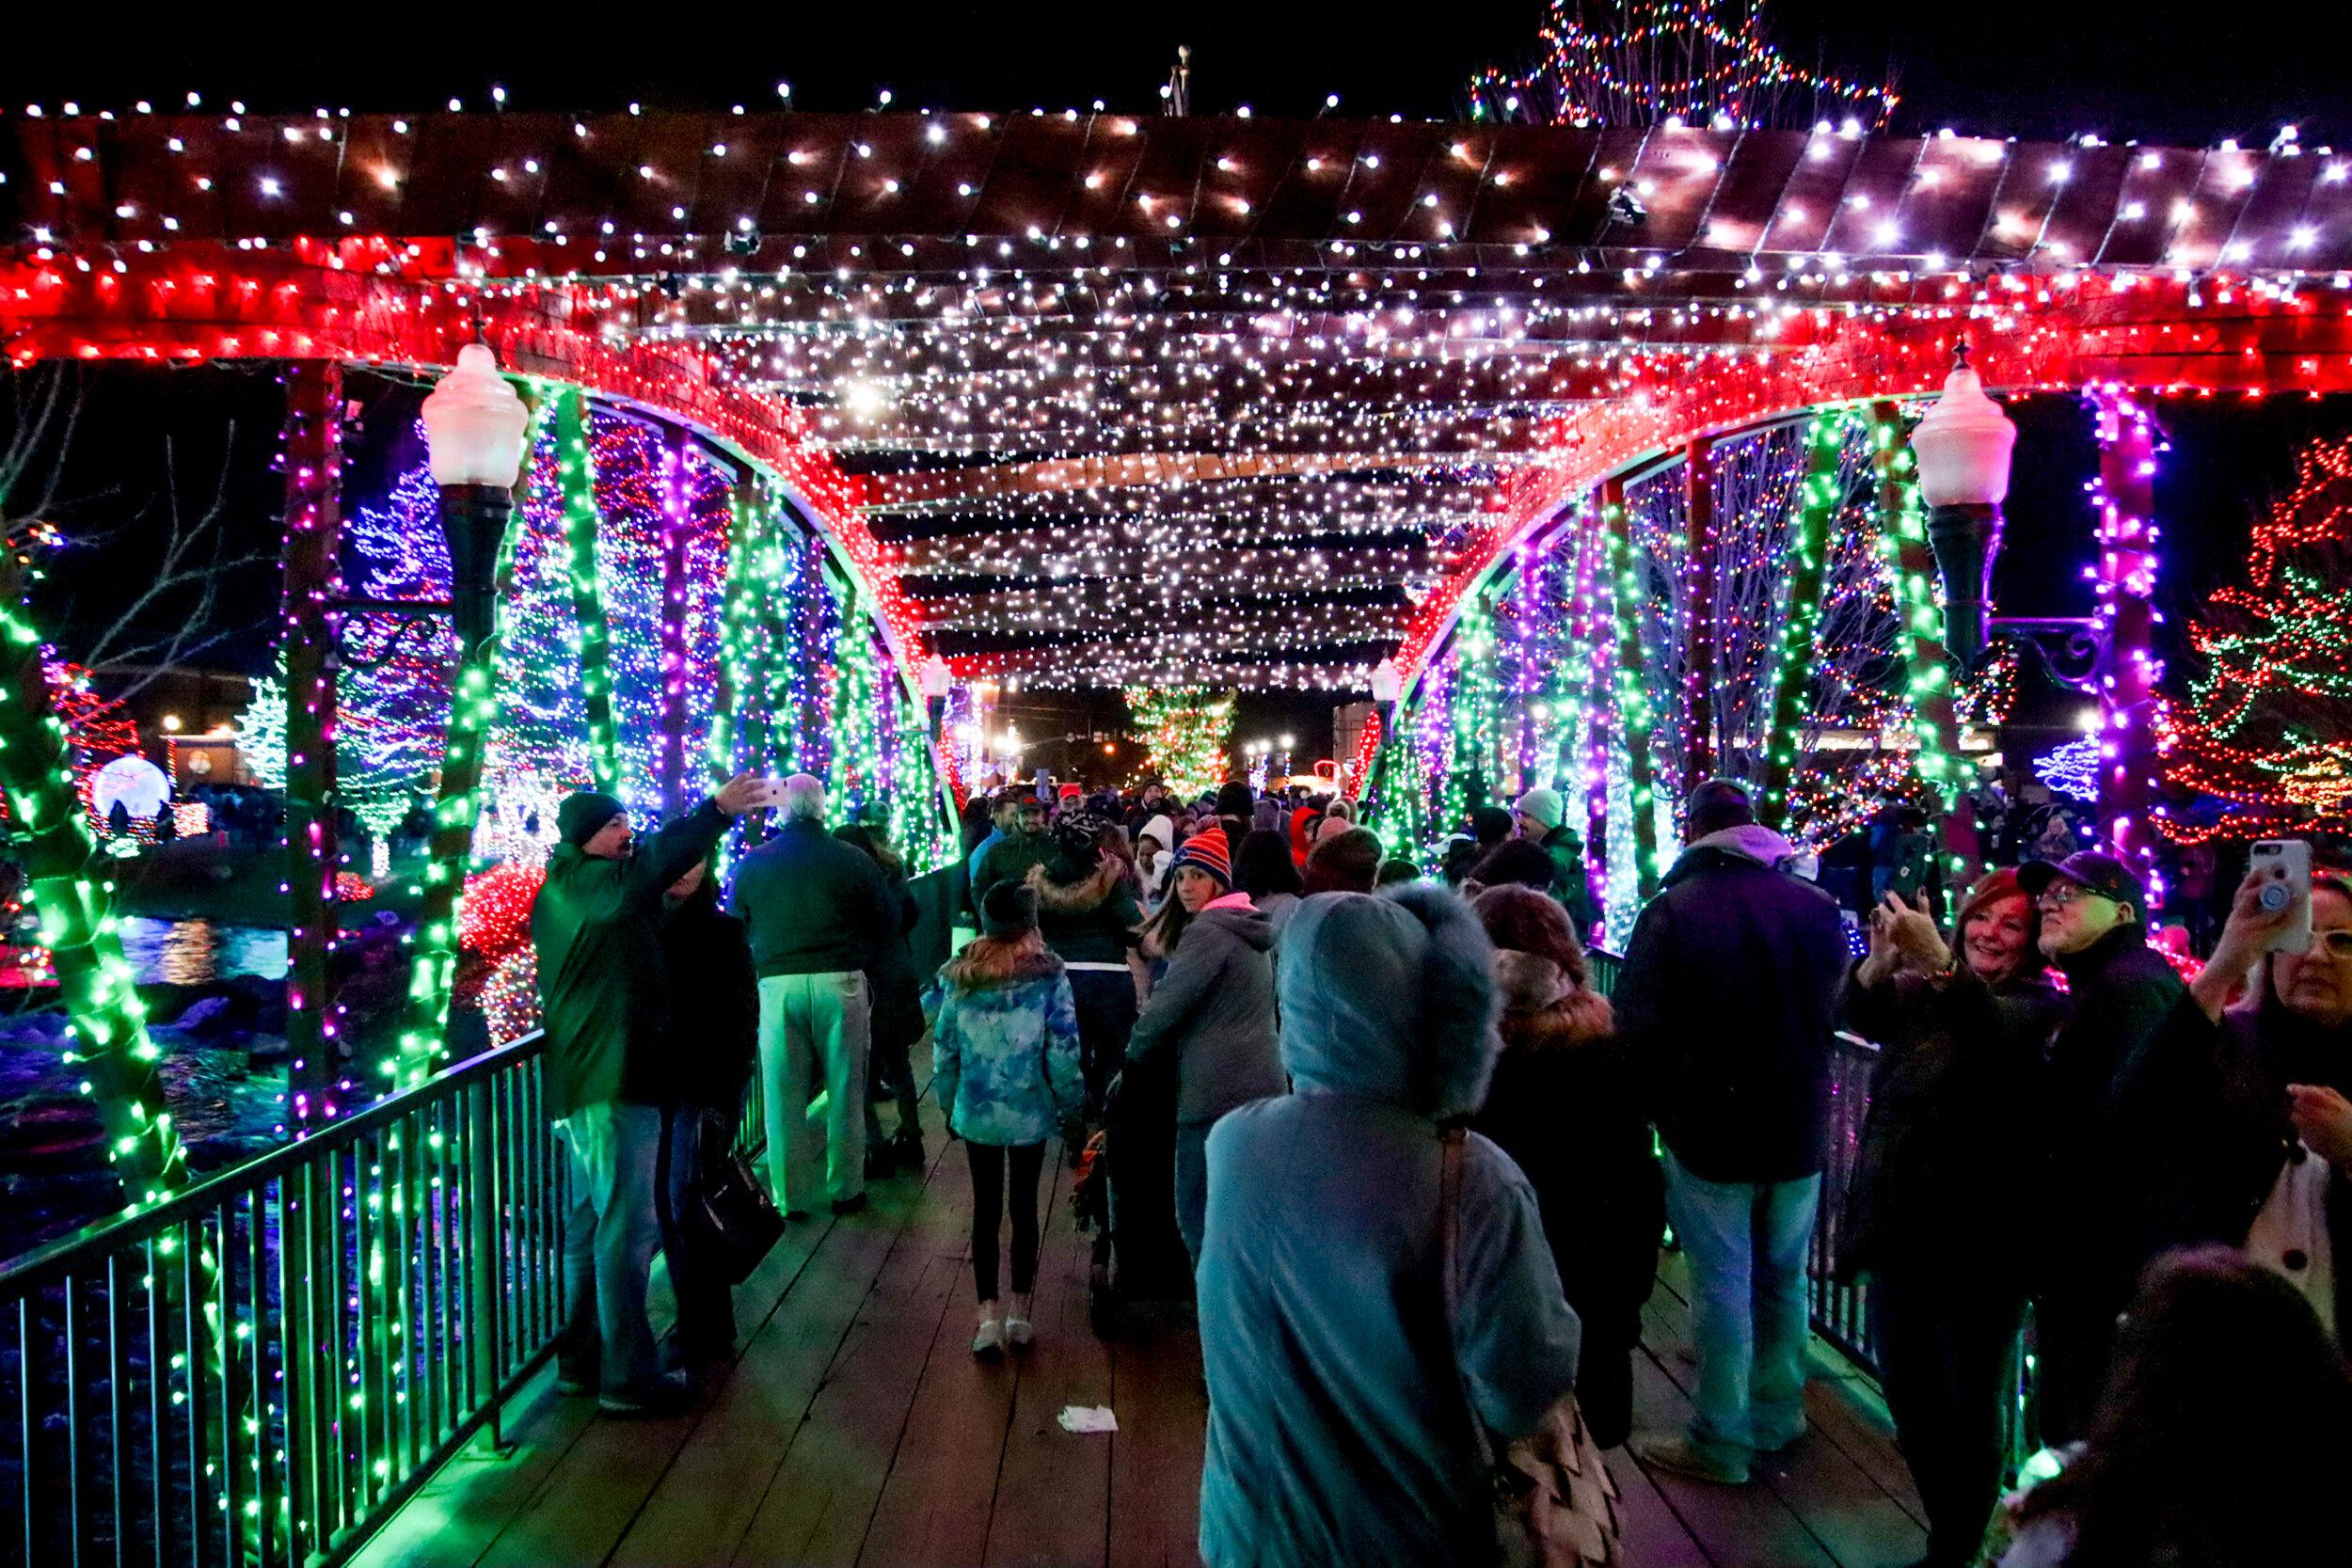 Caldwell Christmas Lights 2020 Caldwell's Winter Wonderland Festival — Indian Creek Plaza